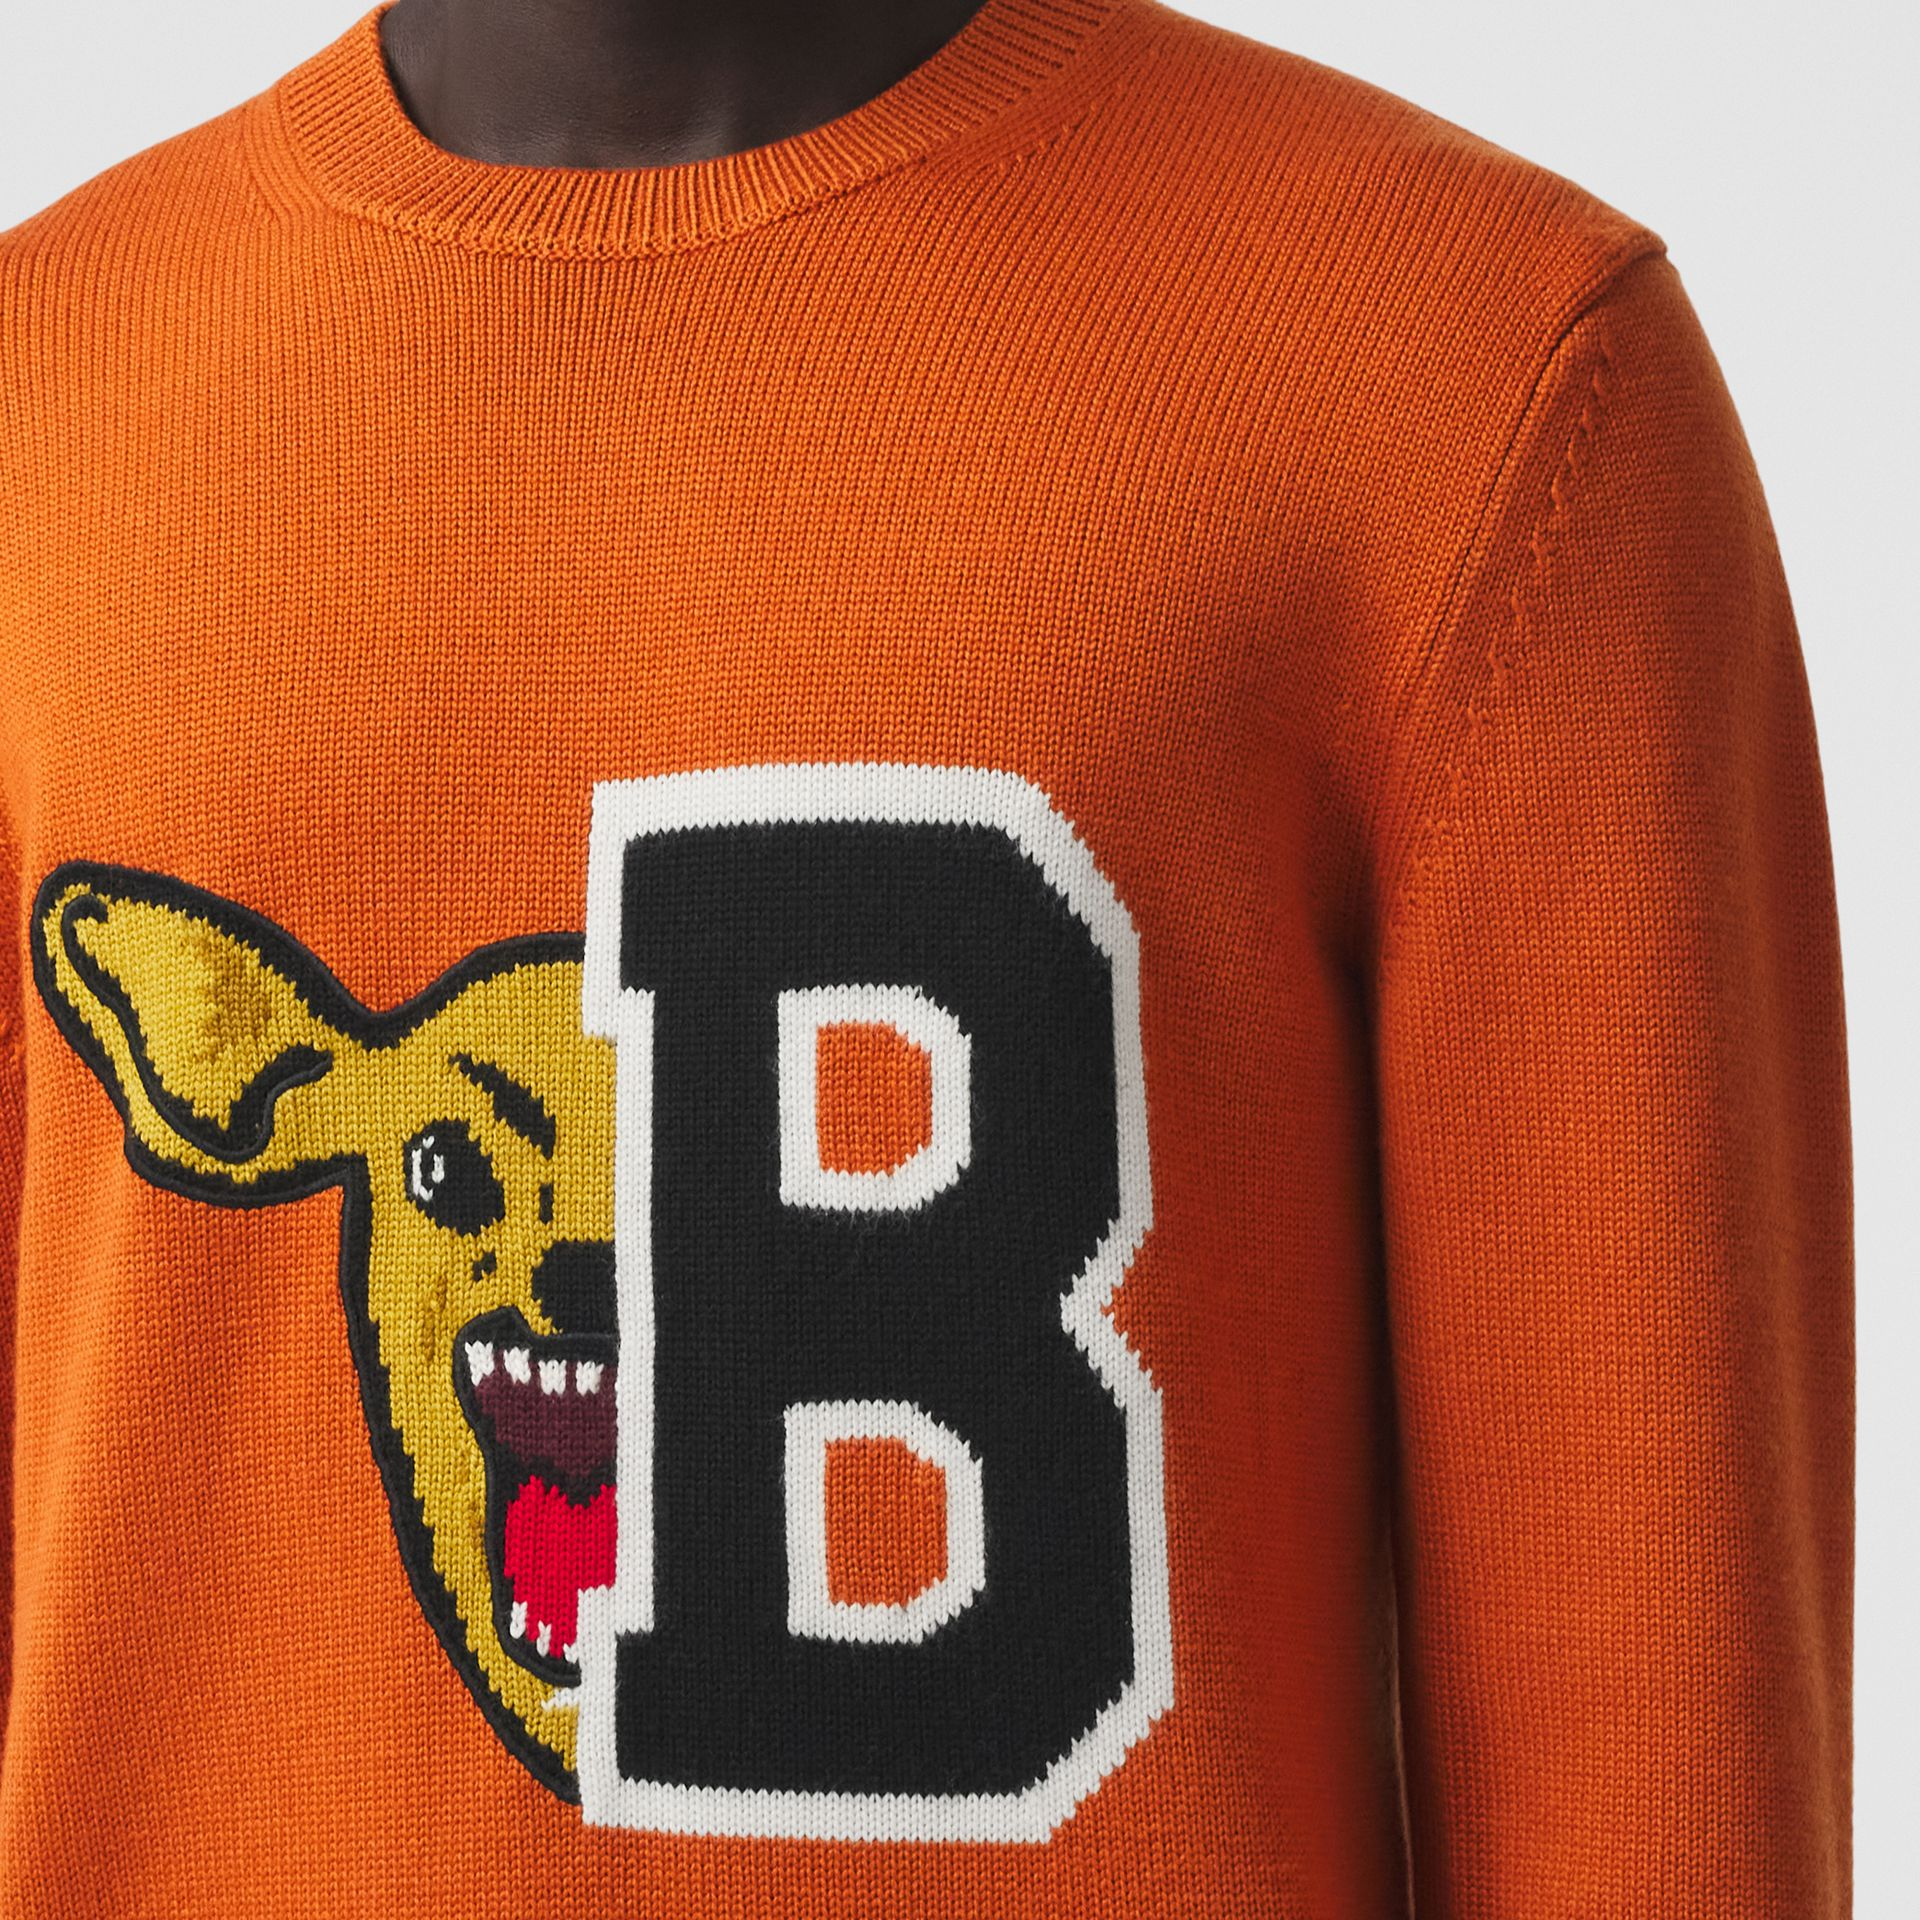 Varsity Graphic Merino Wool Jacquard Sweater in Burnt Orange - Men | Burberry - gallery image 1